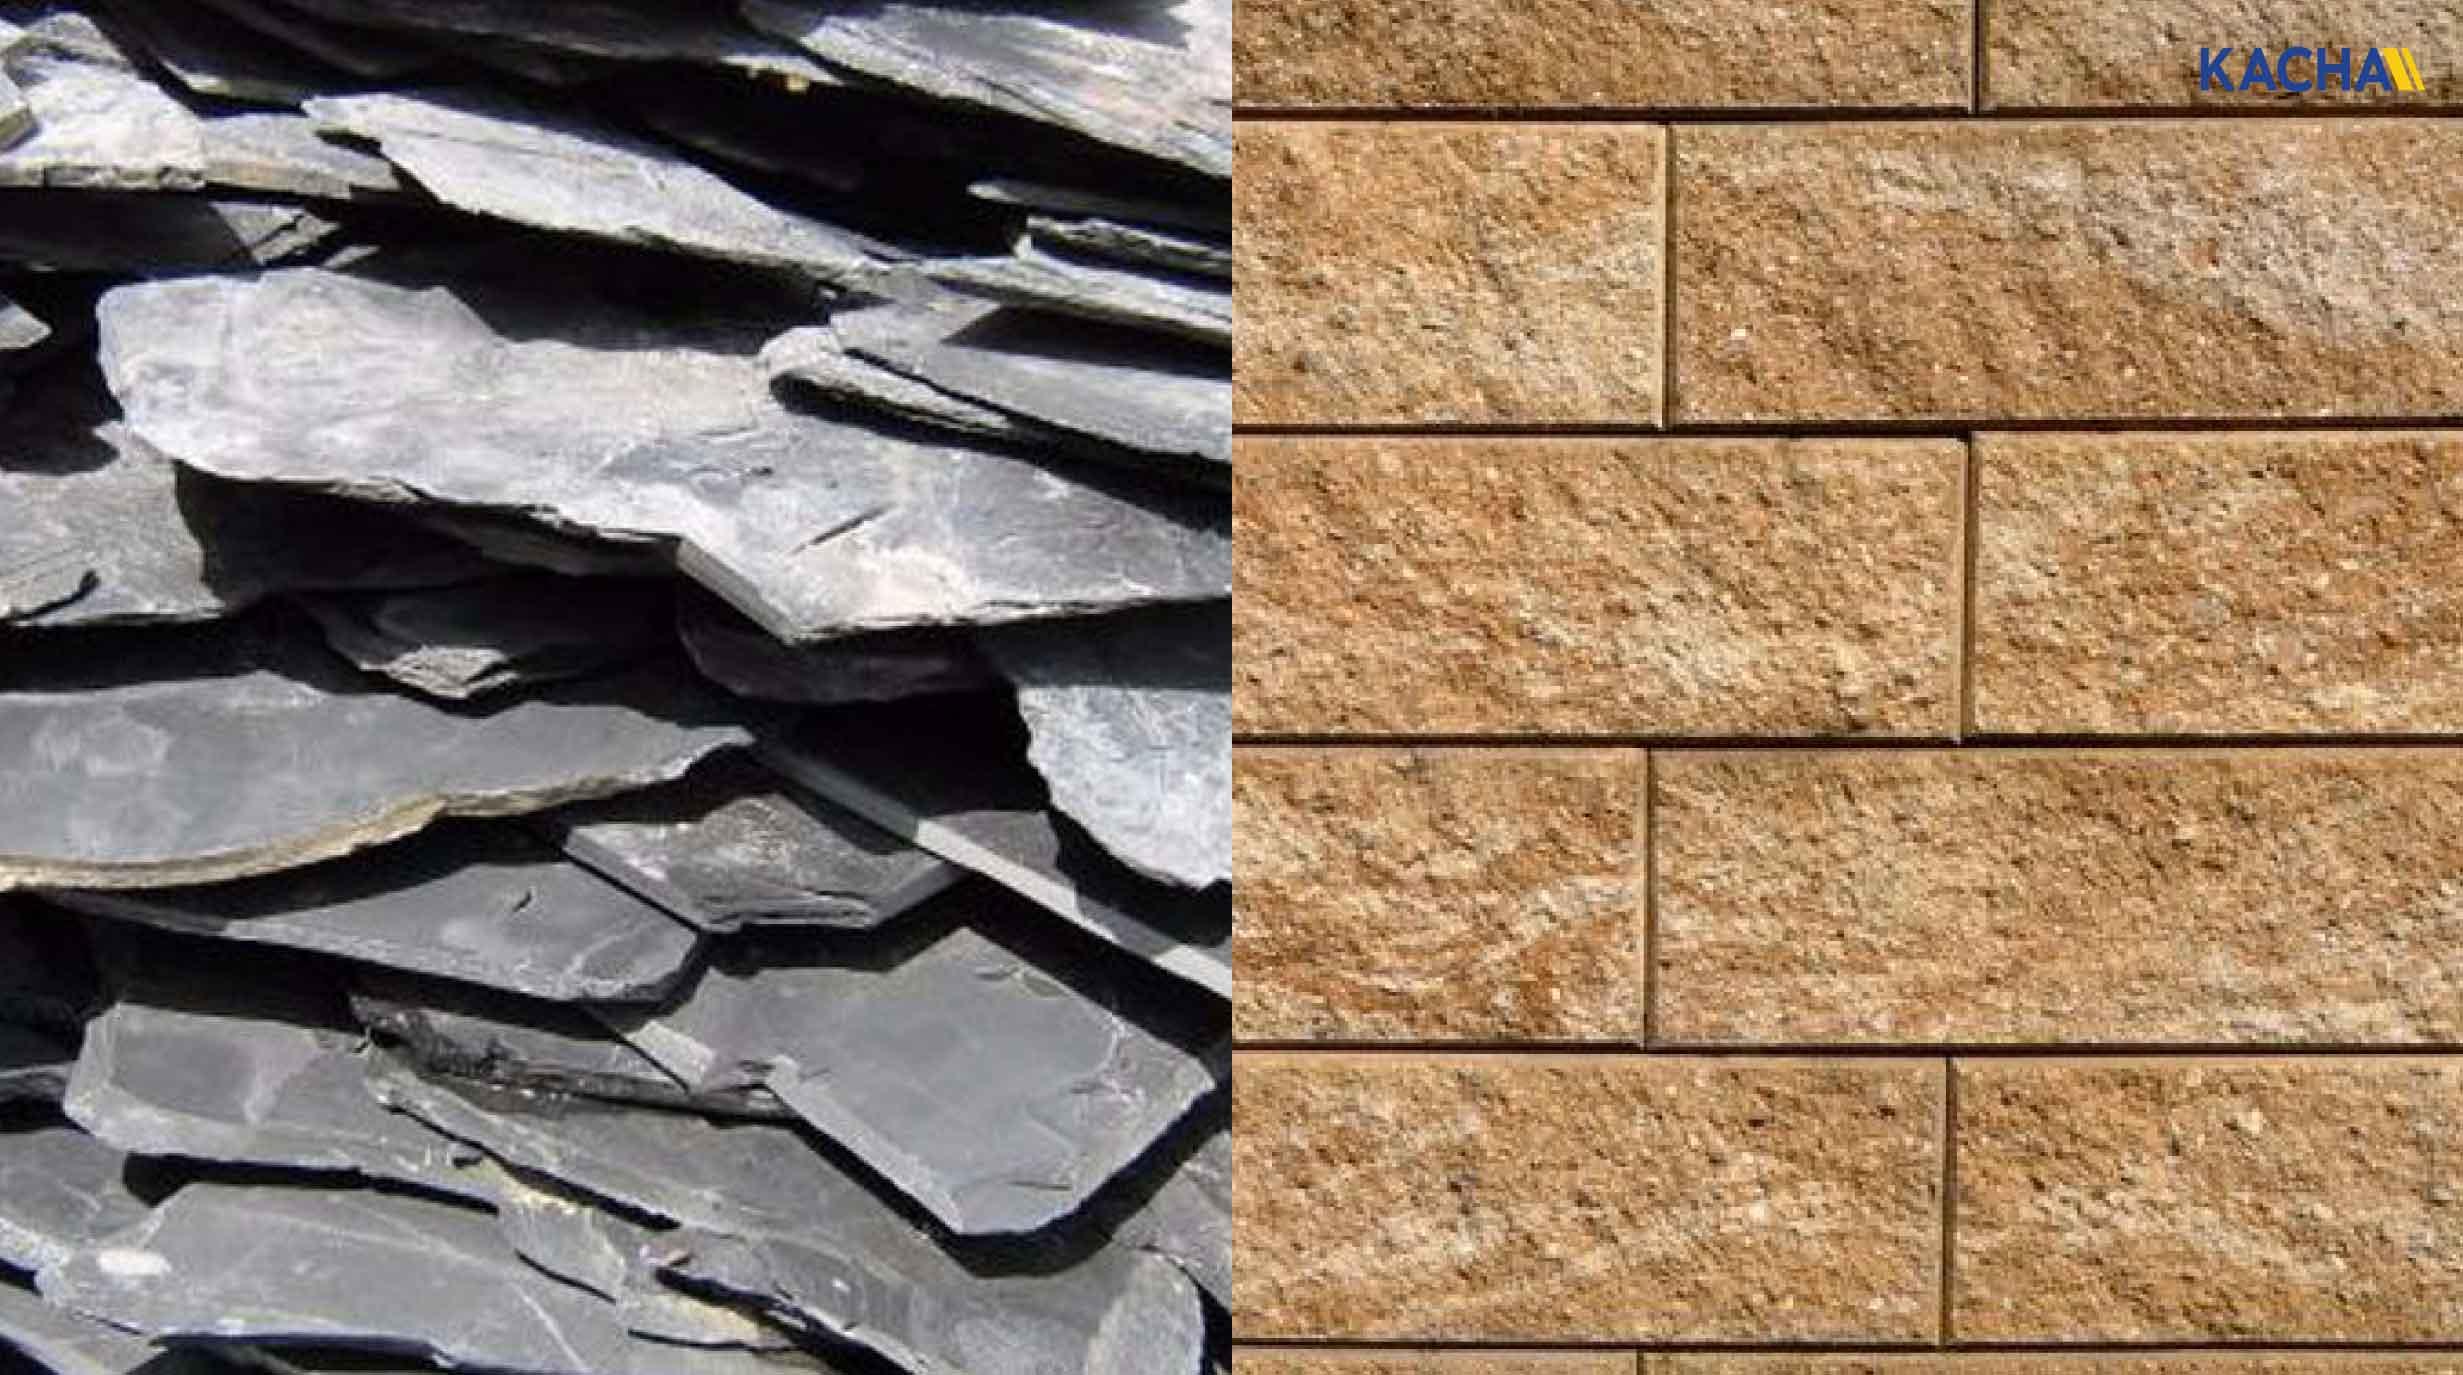 210508-Content-หินเทียมหินธรรมชาติ-คุณสมบัติน่ารู้-ก่อนนำไปใช้งาน03